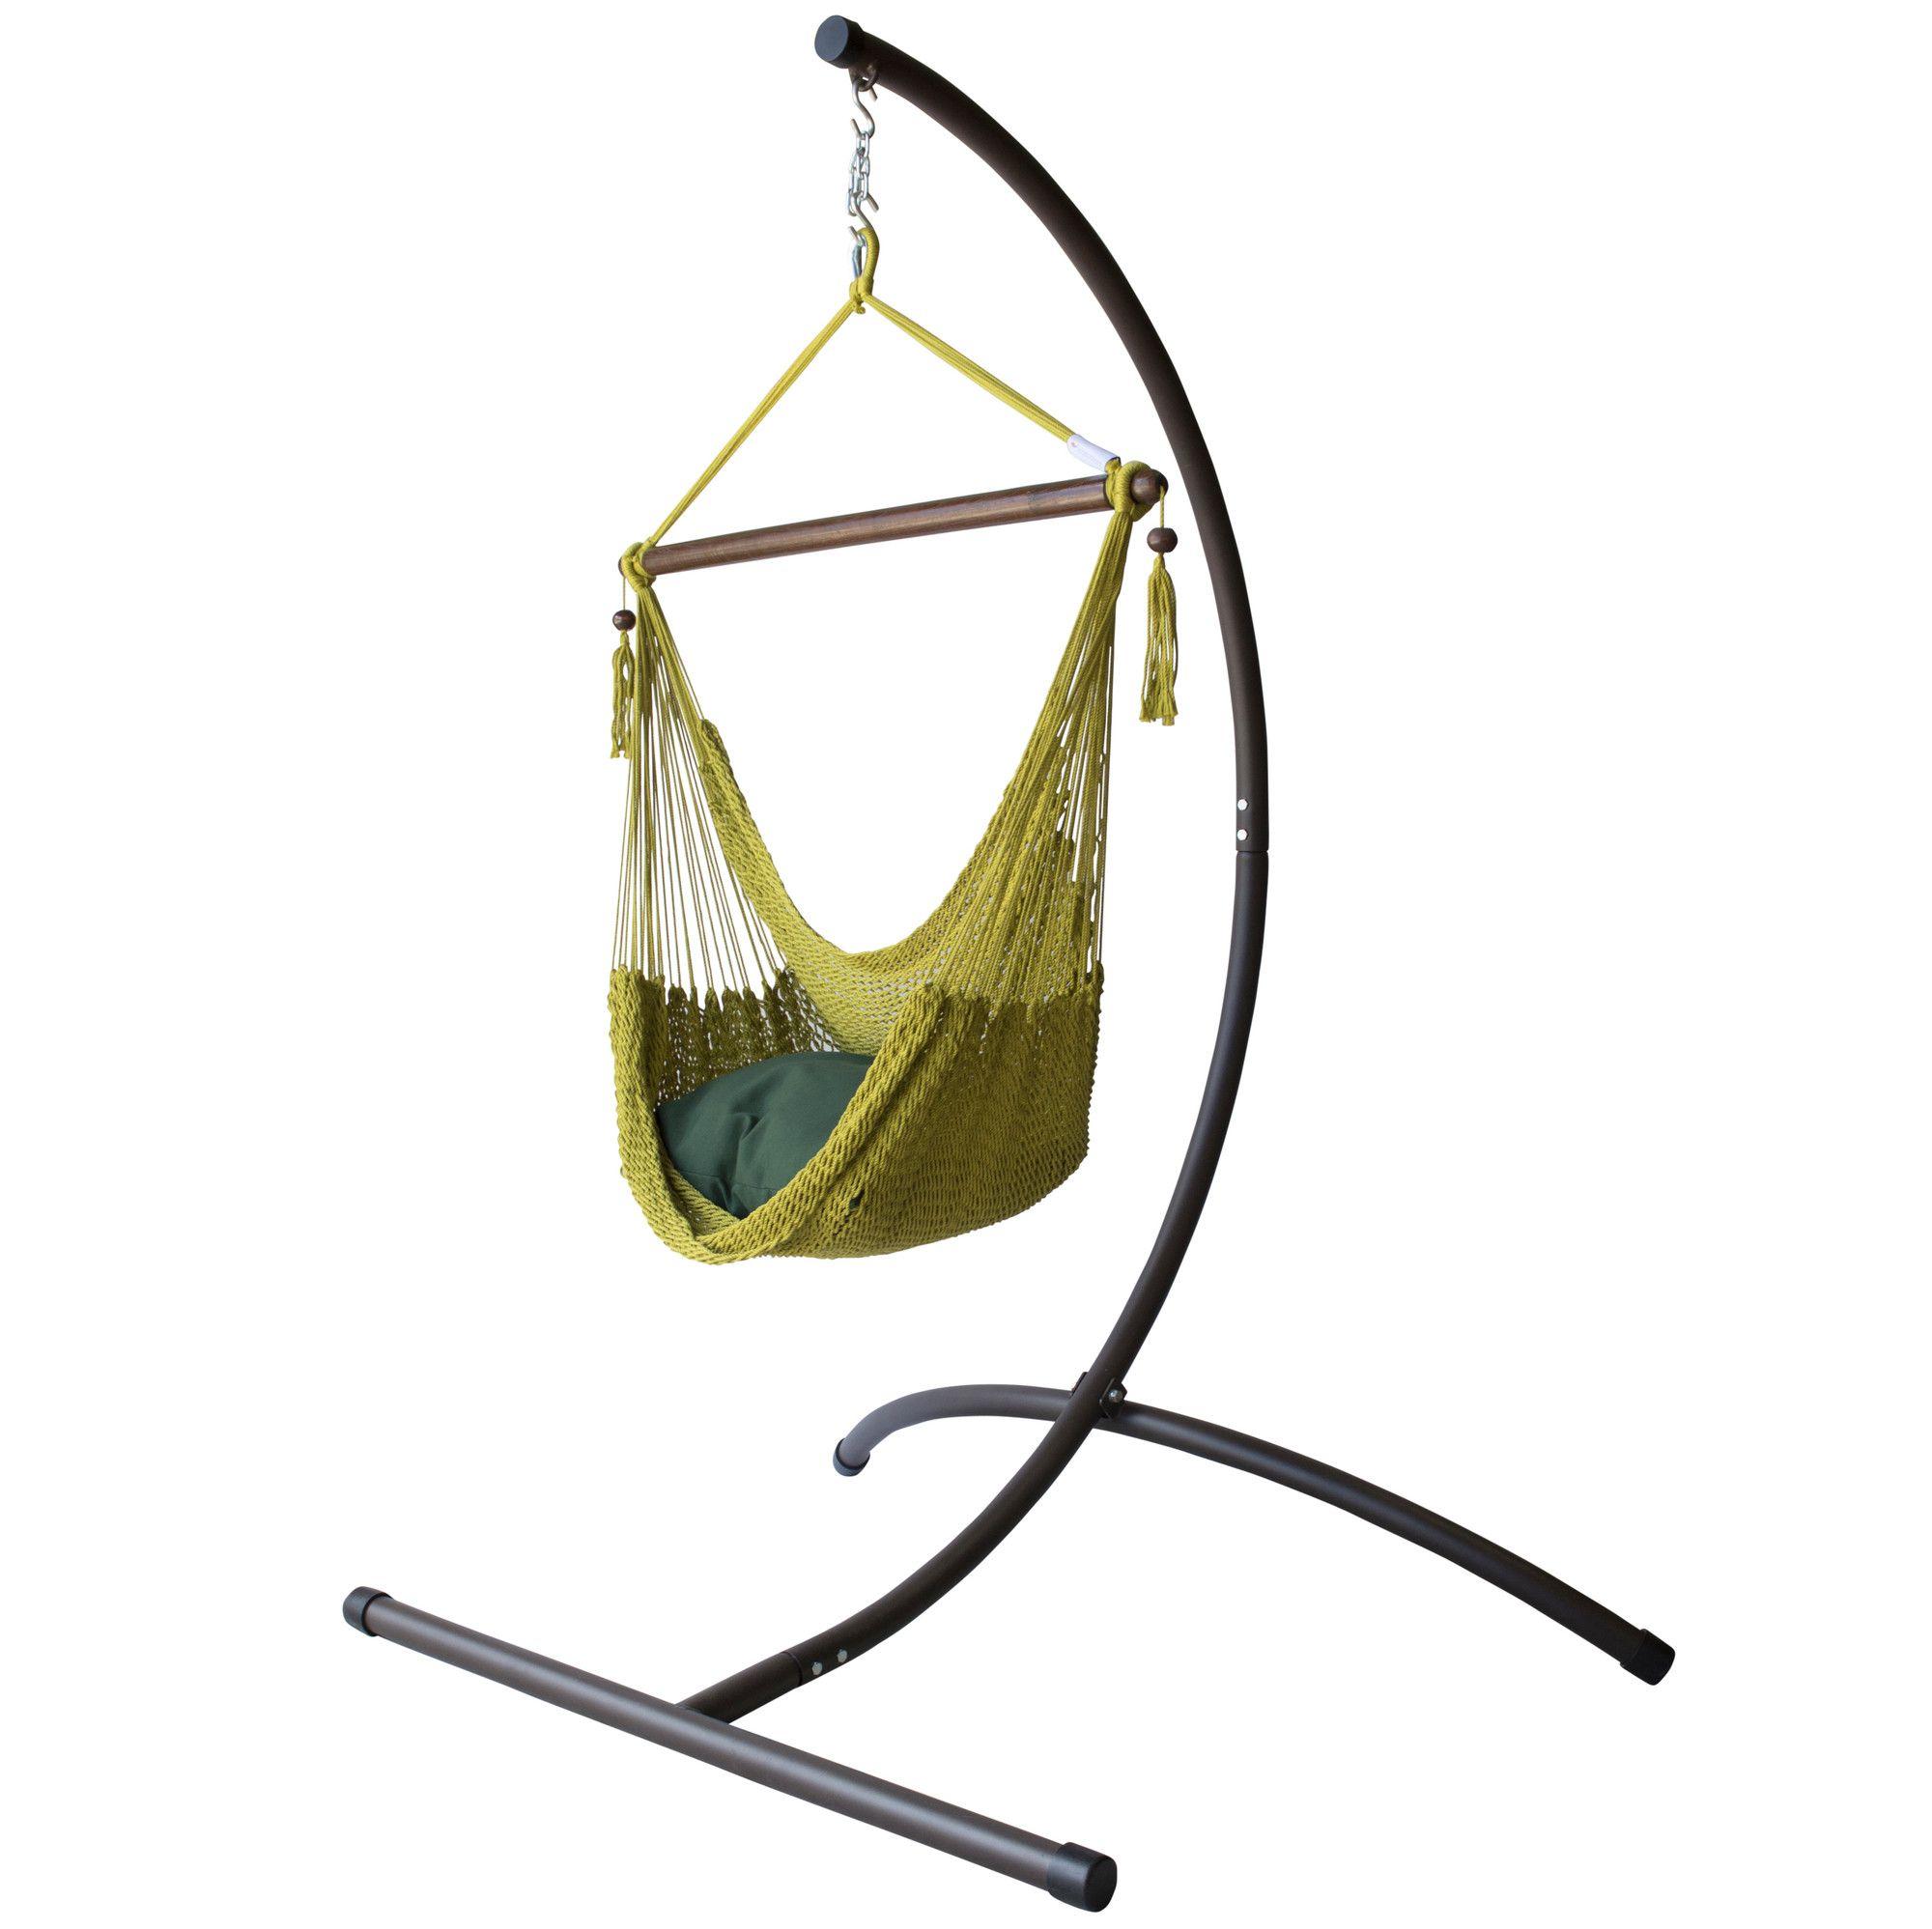 Caribbean Hammock With Stand Hammock Chair Hammock Chair Stand